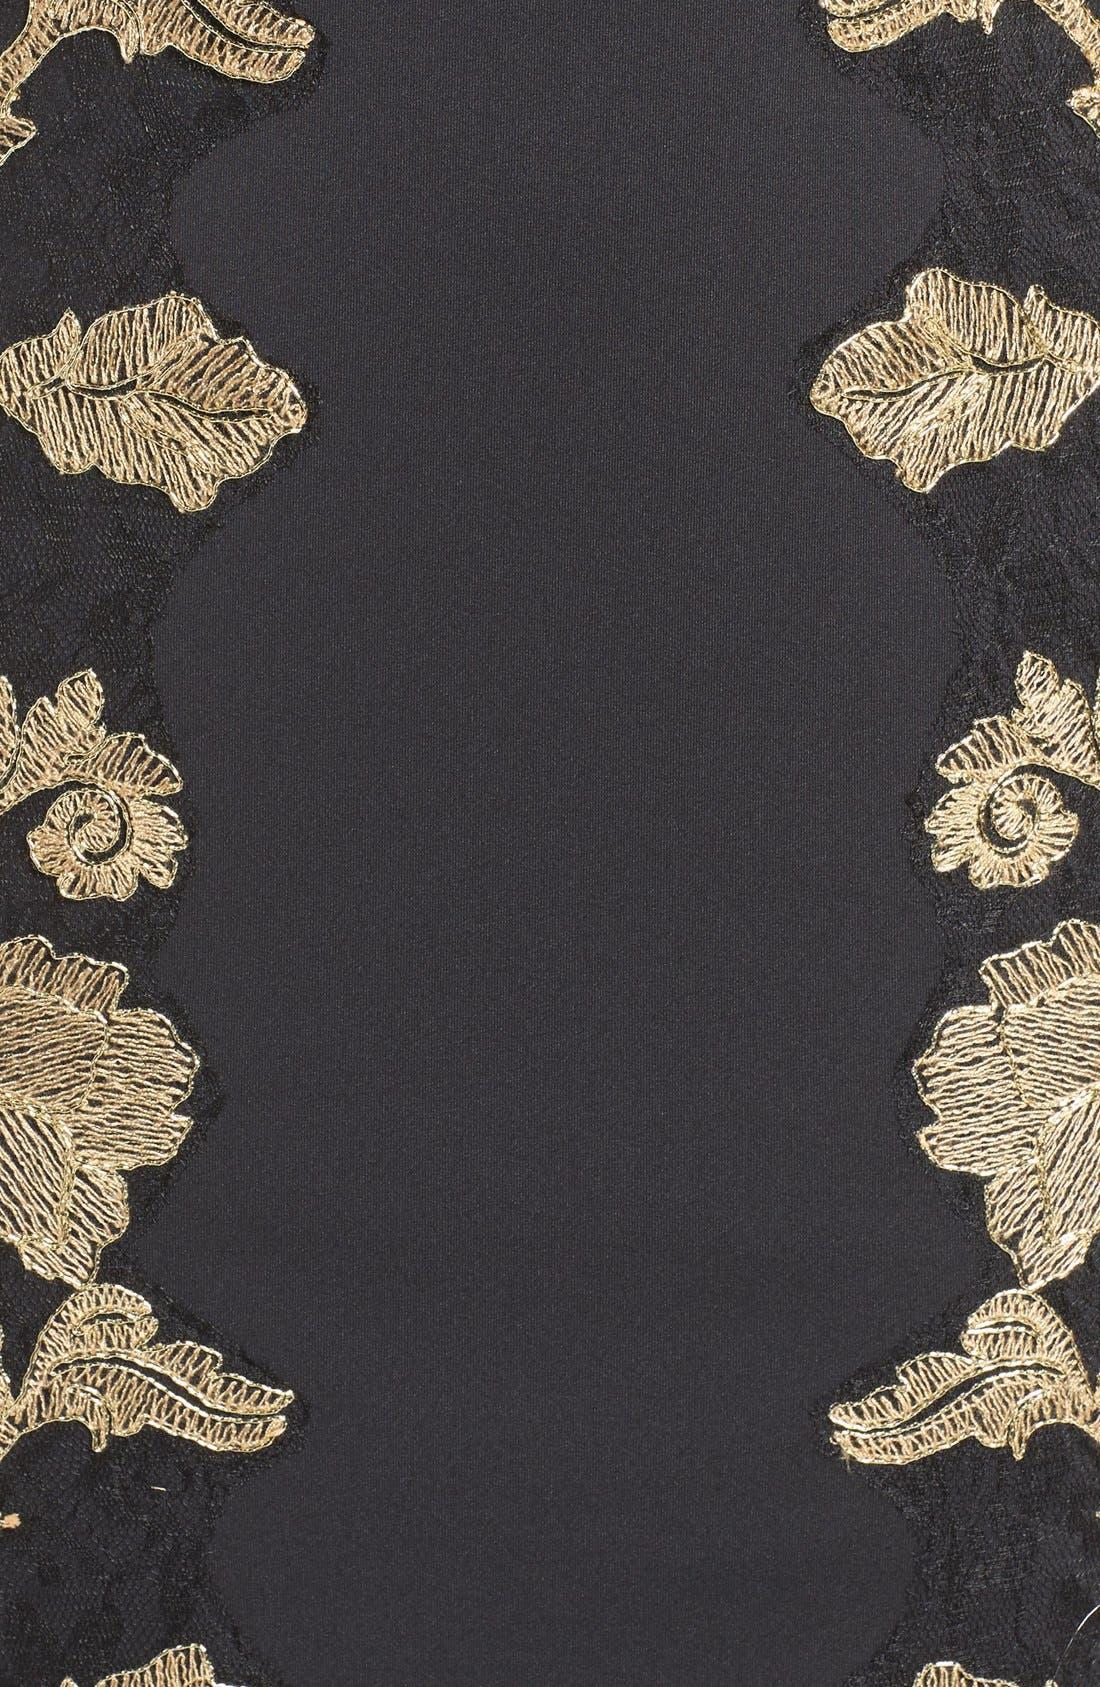 Embroidered Neoprene Sheath Dress,                             Alternate thumbnail 5, color,